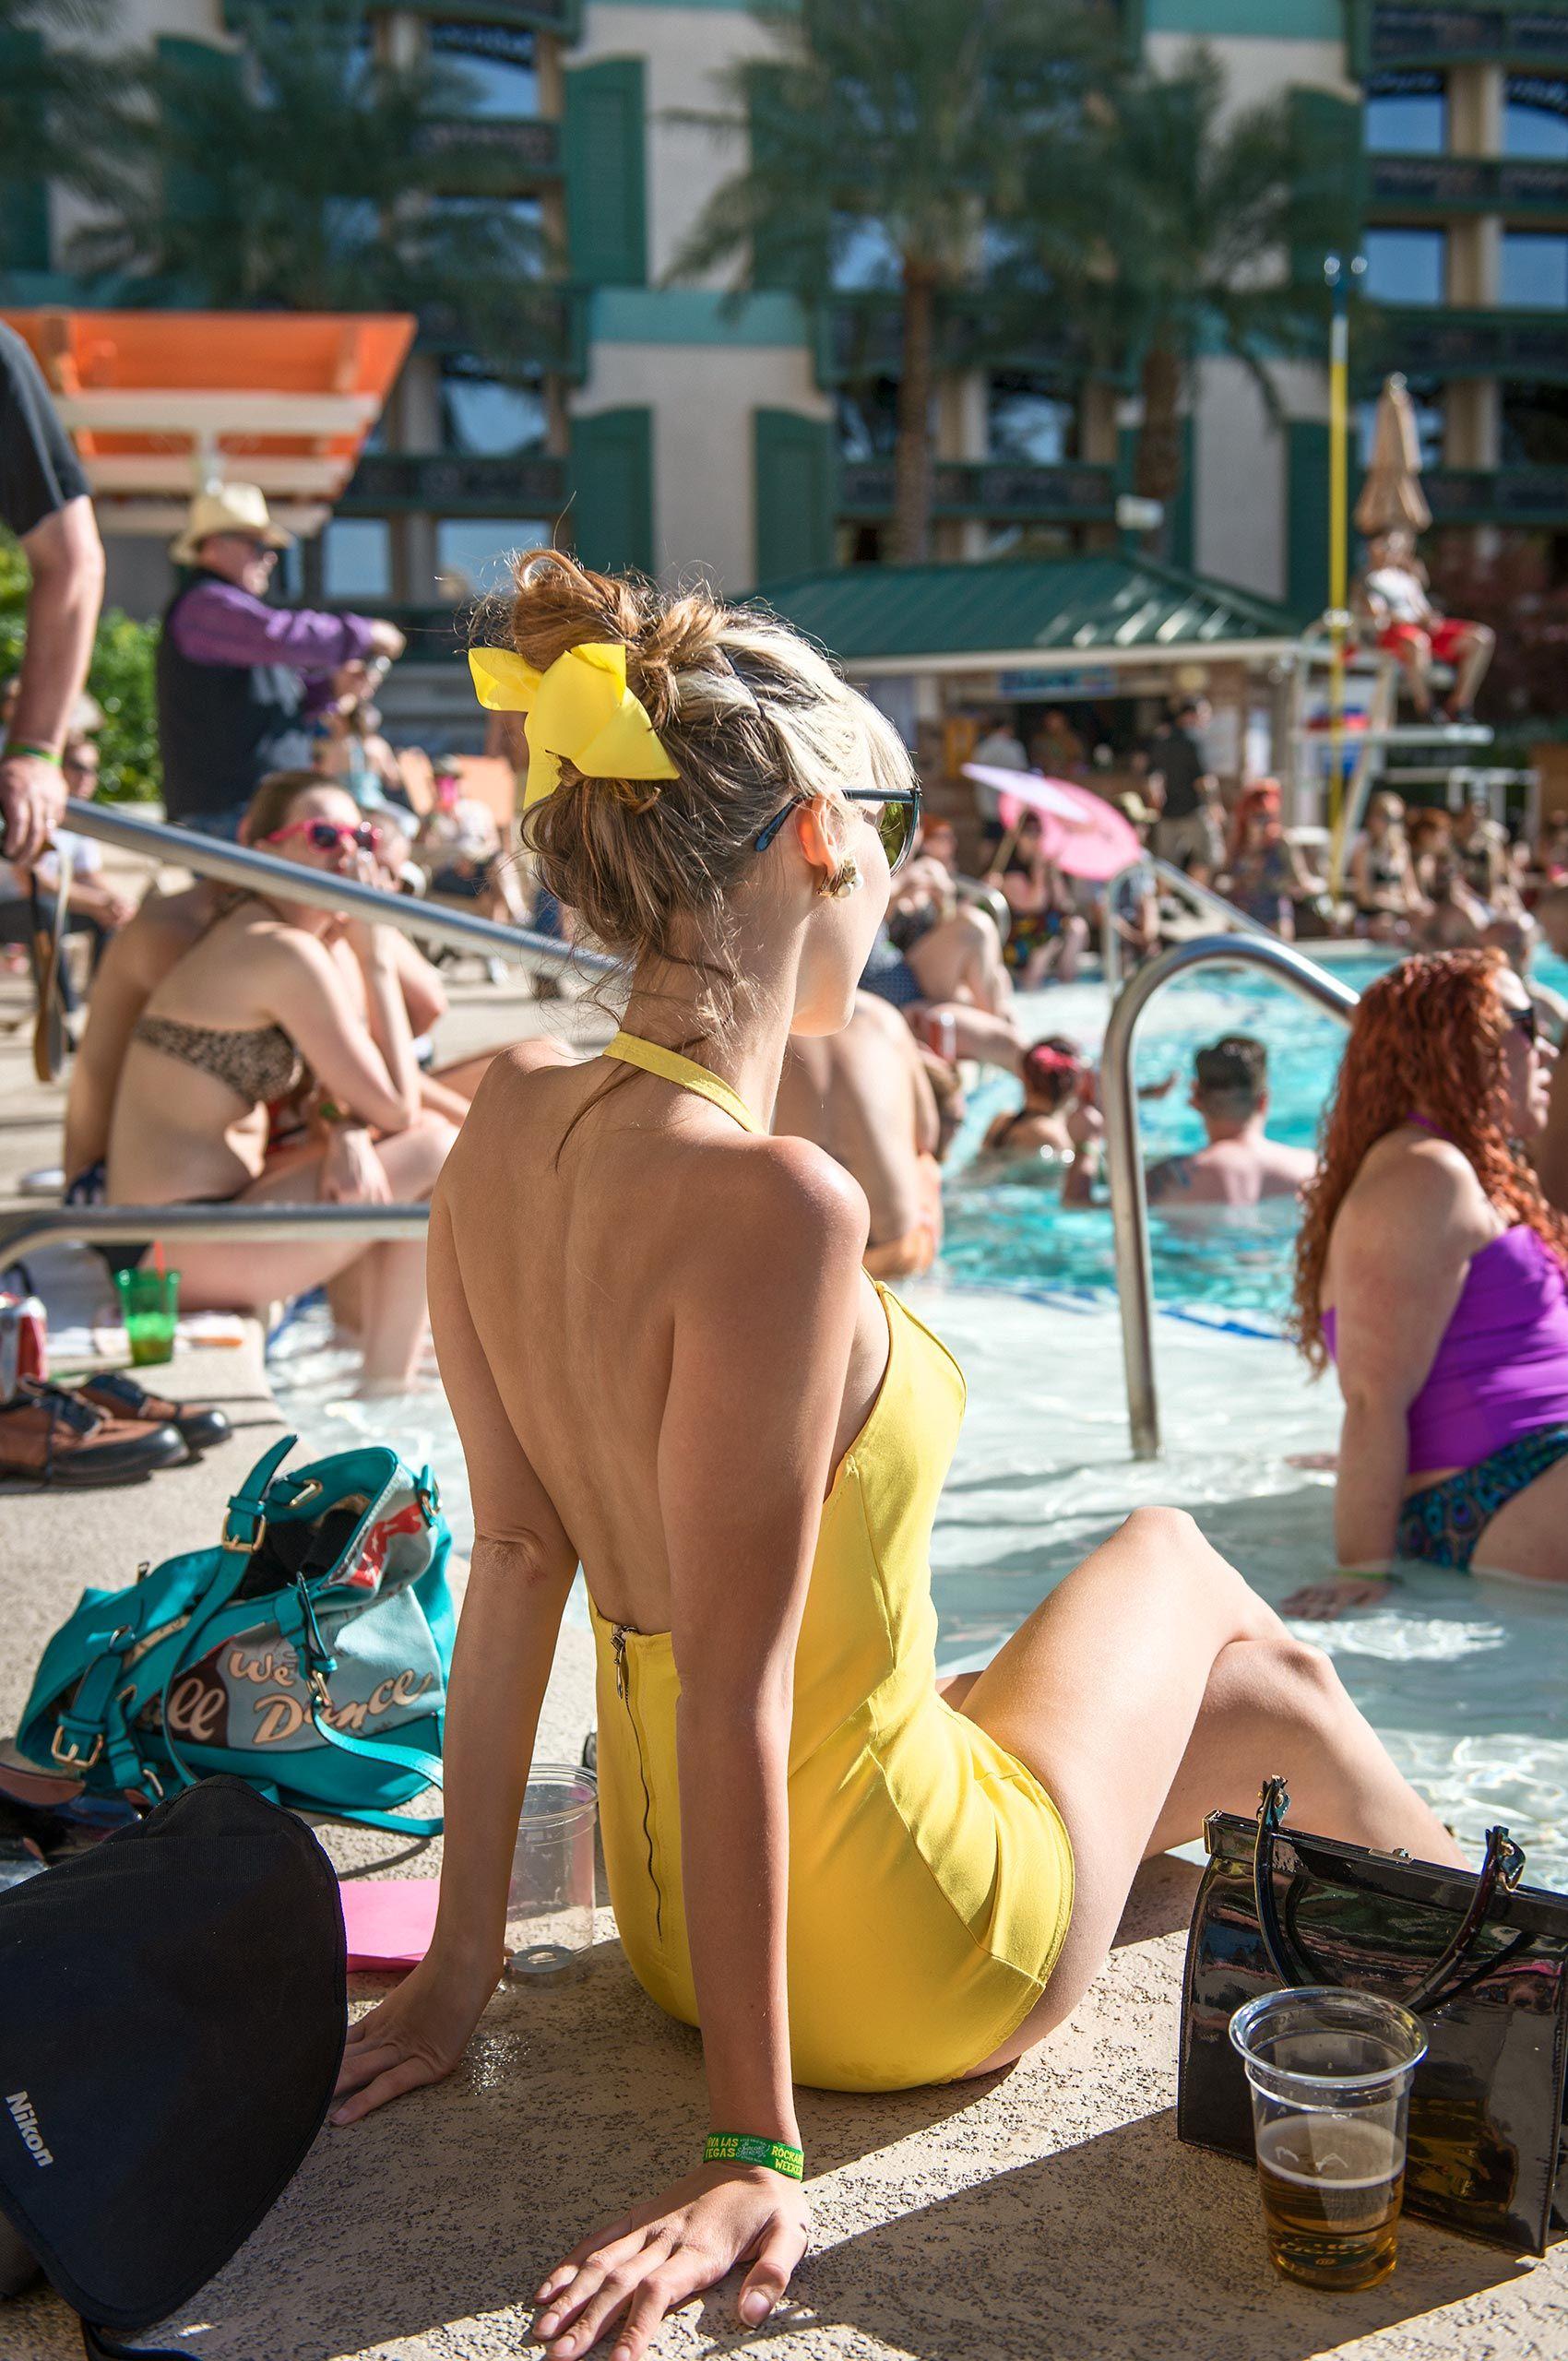 poolside-beauty-vivalasvegas-HenrikOlundPhotography.jpg